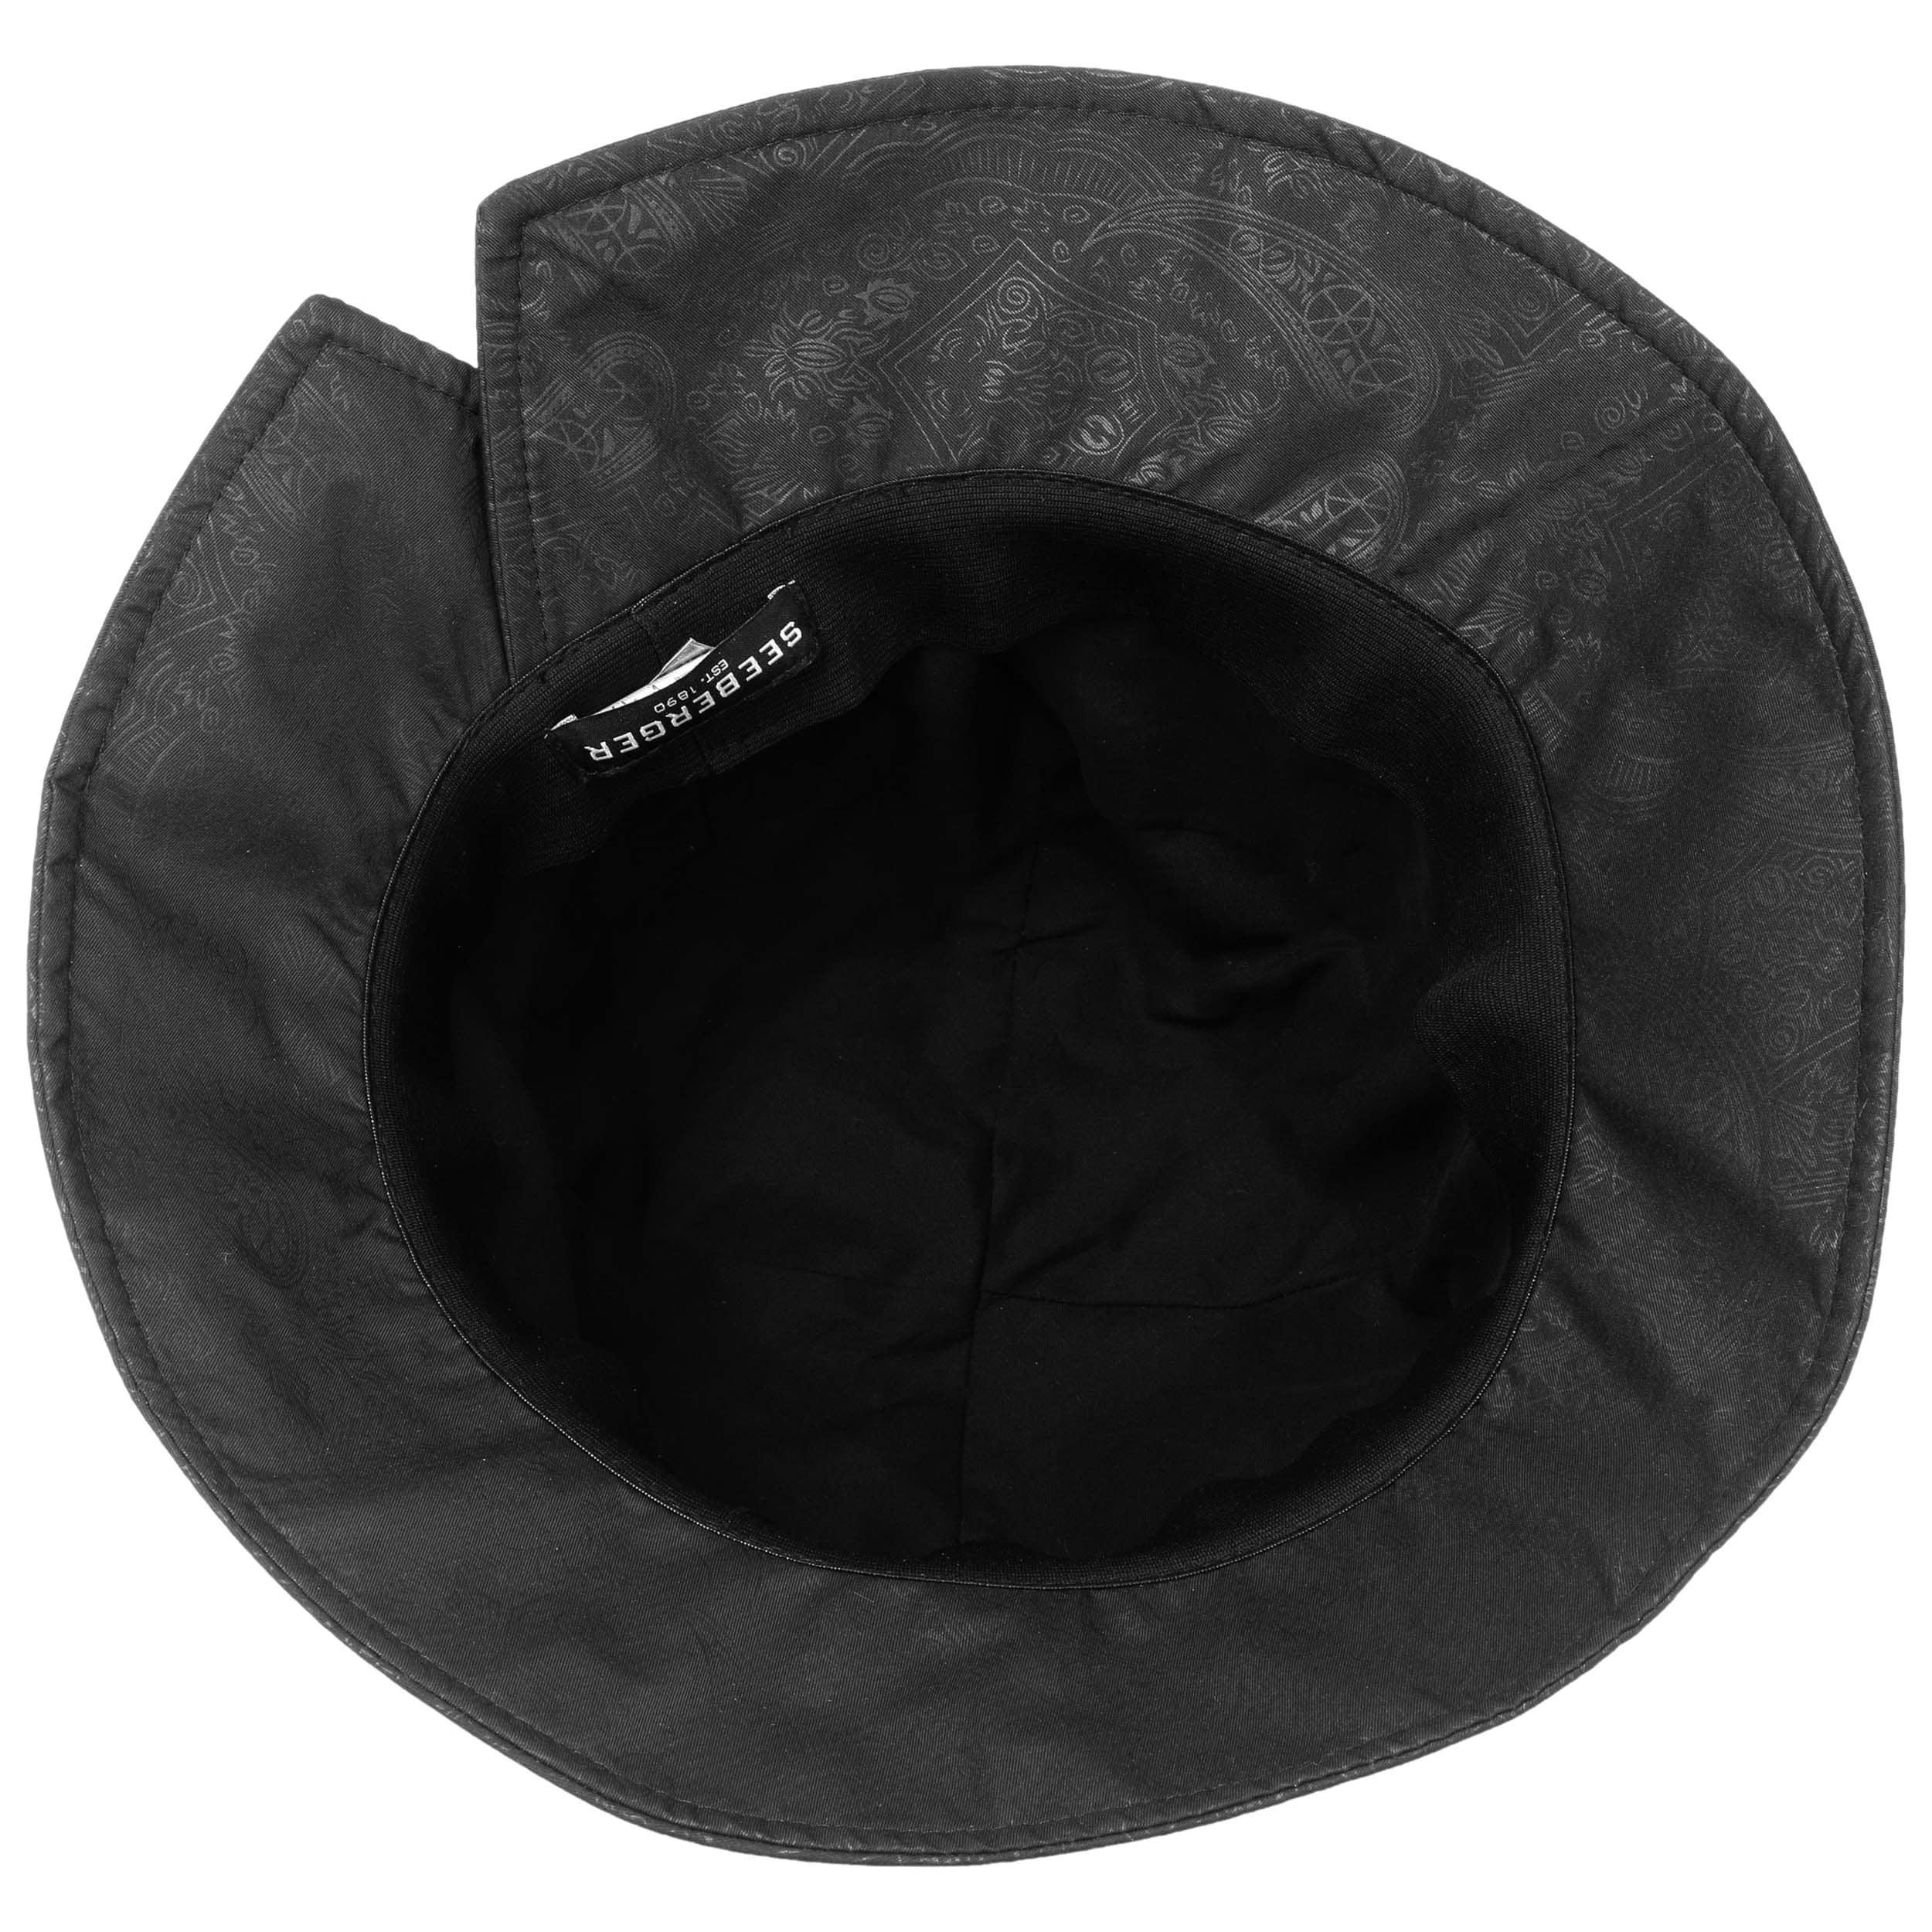 ... Paisley Cloche Rain Hat by Seeberger - black 2 ... bef9136b7b5a